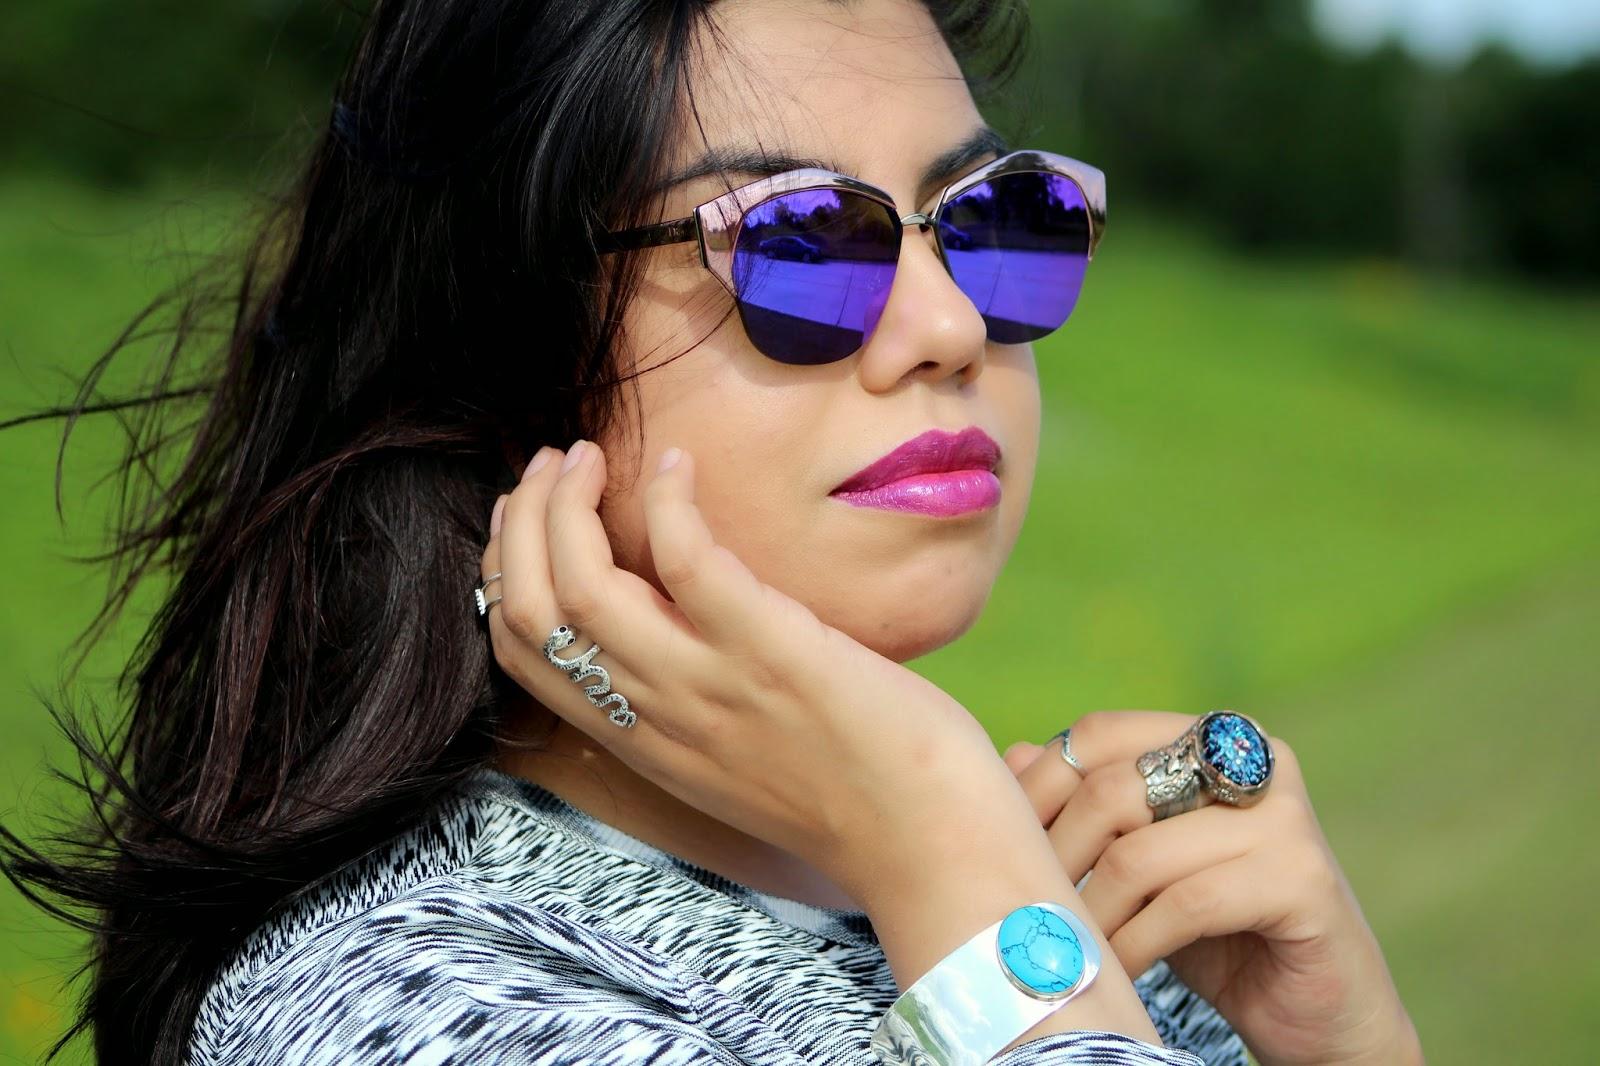 dior sunglassess i24 mirror